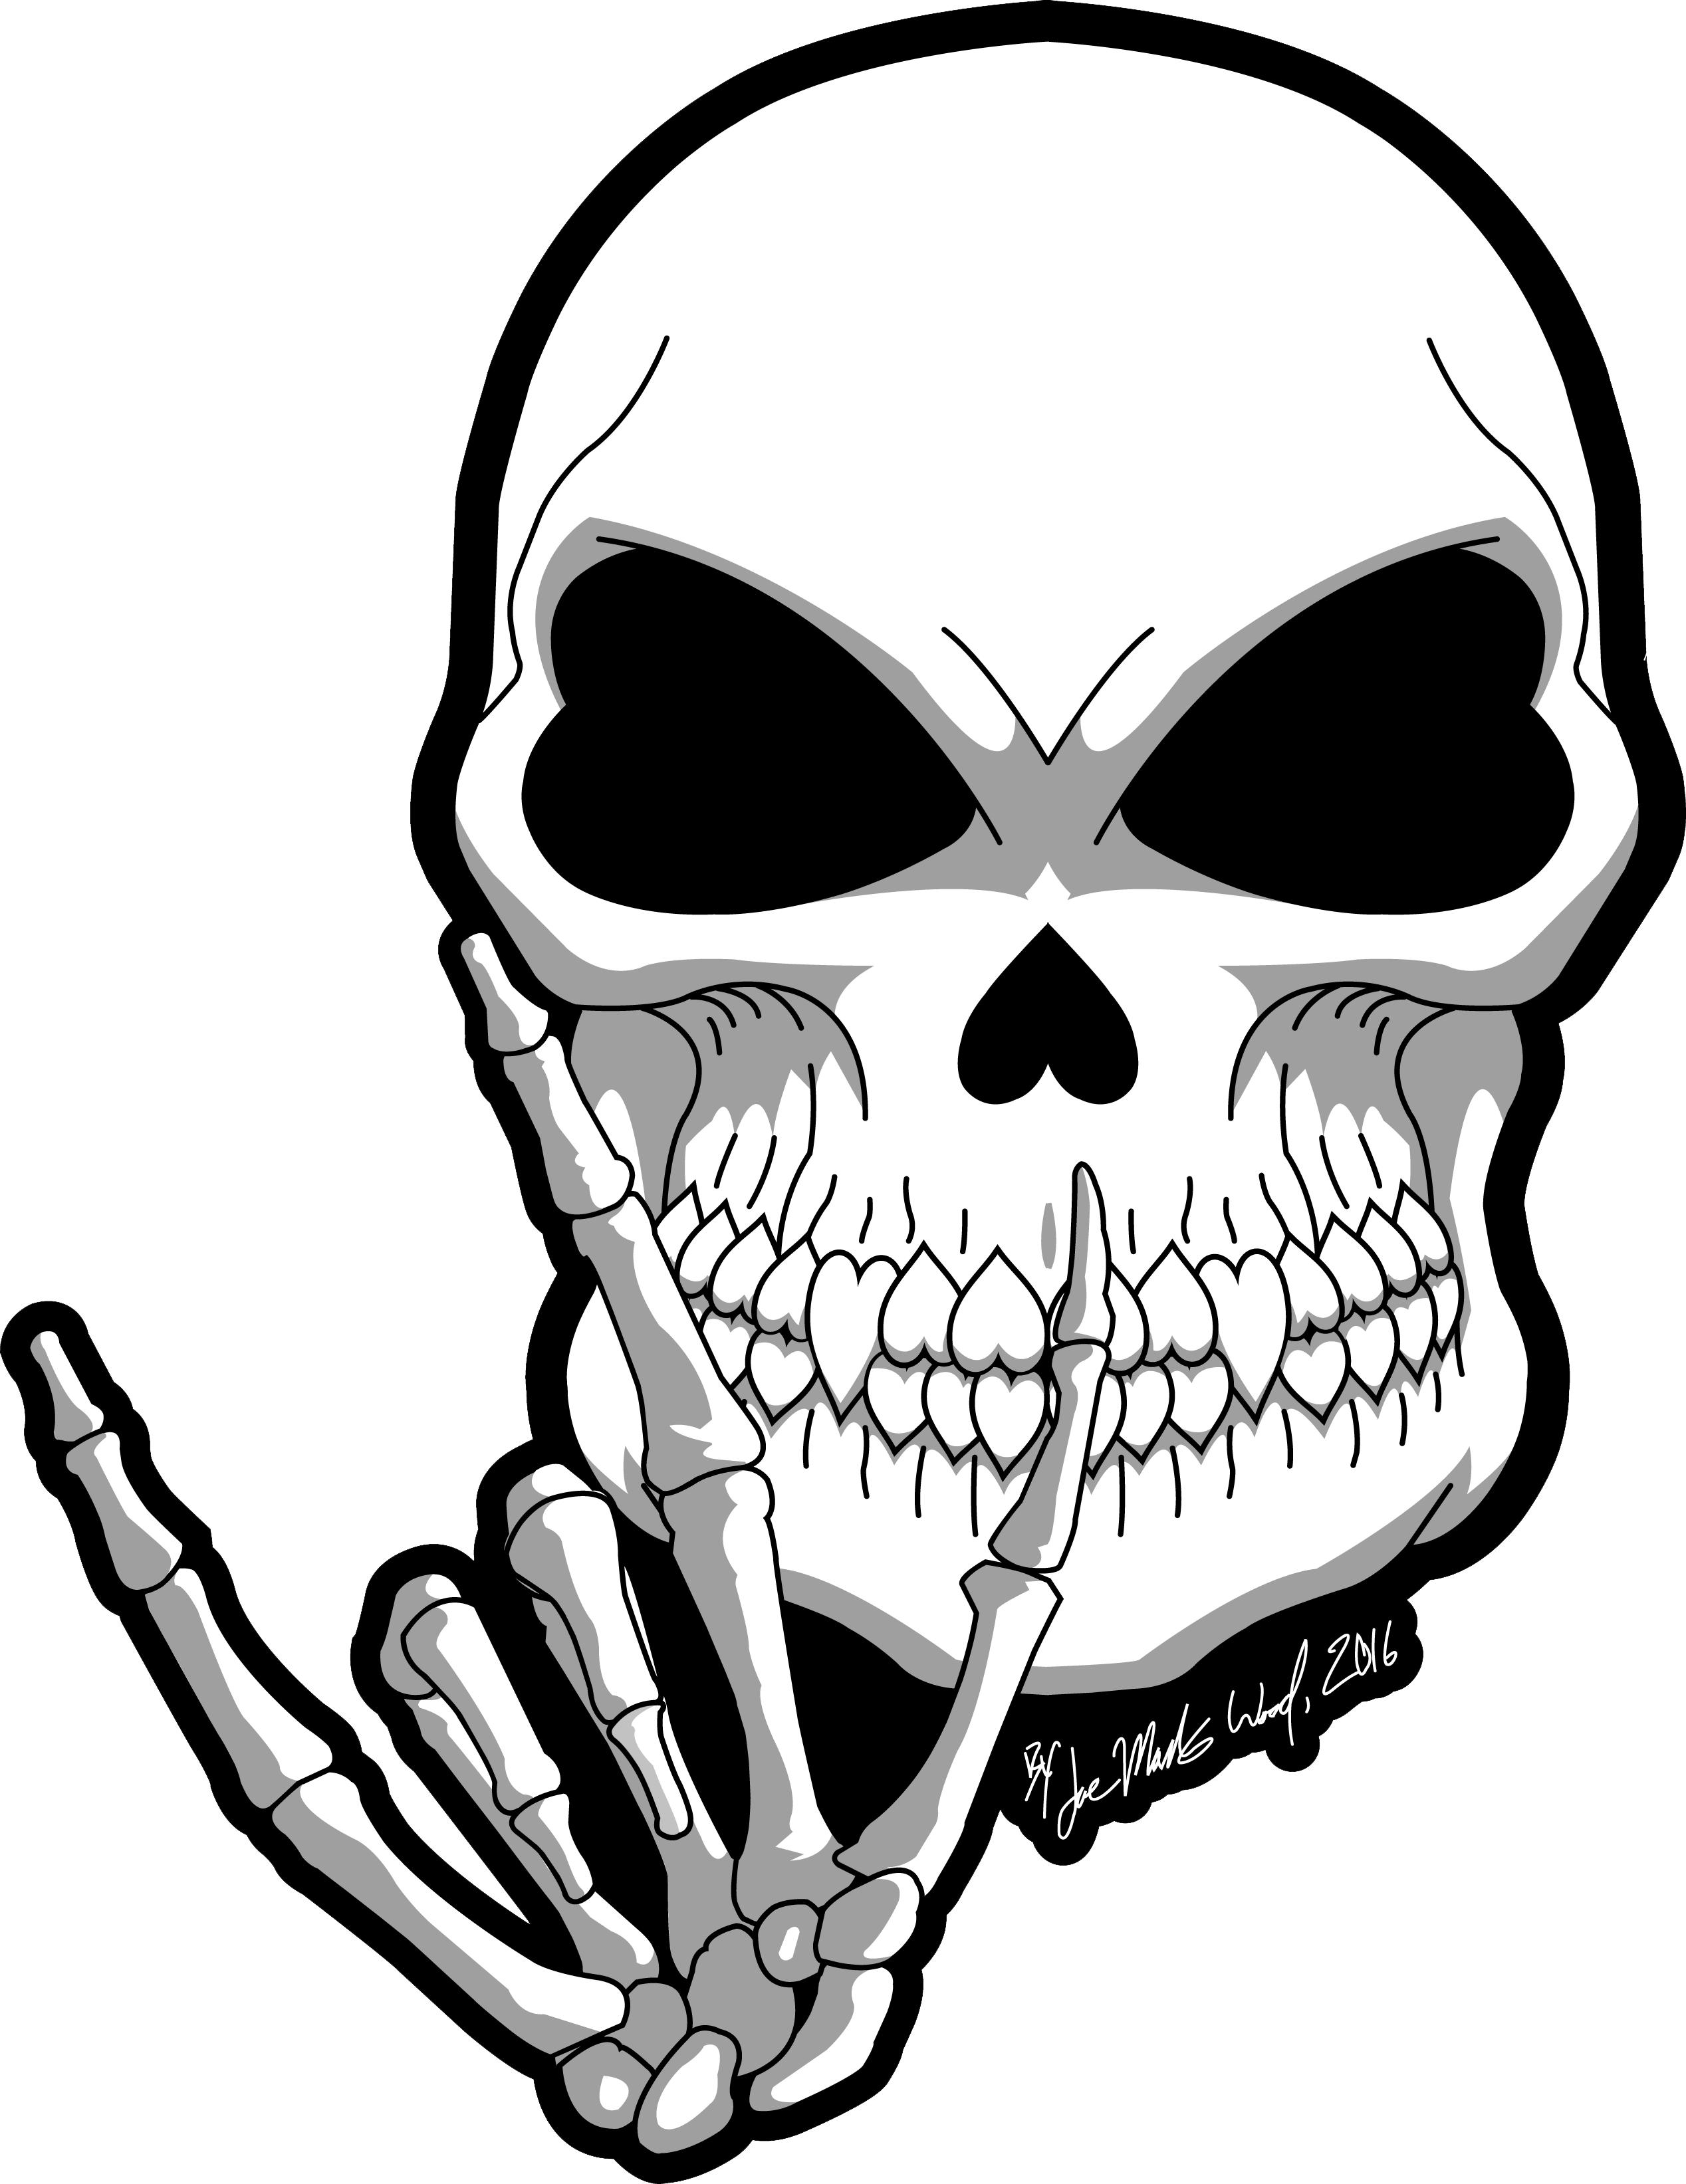 2536x3286 Deaf Skull's Hand Sign Language Mean